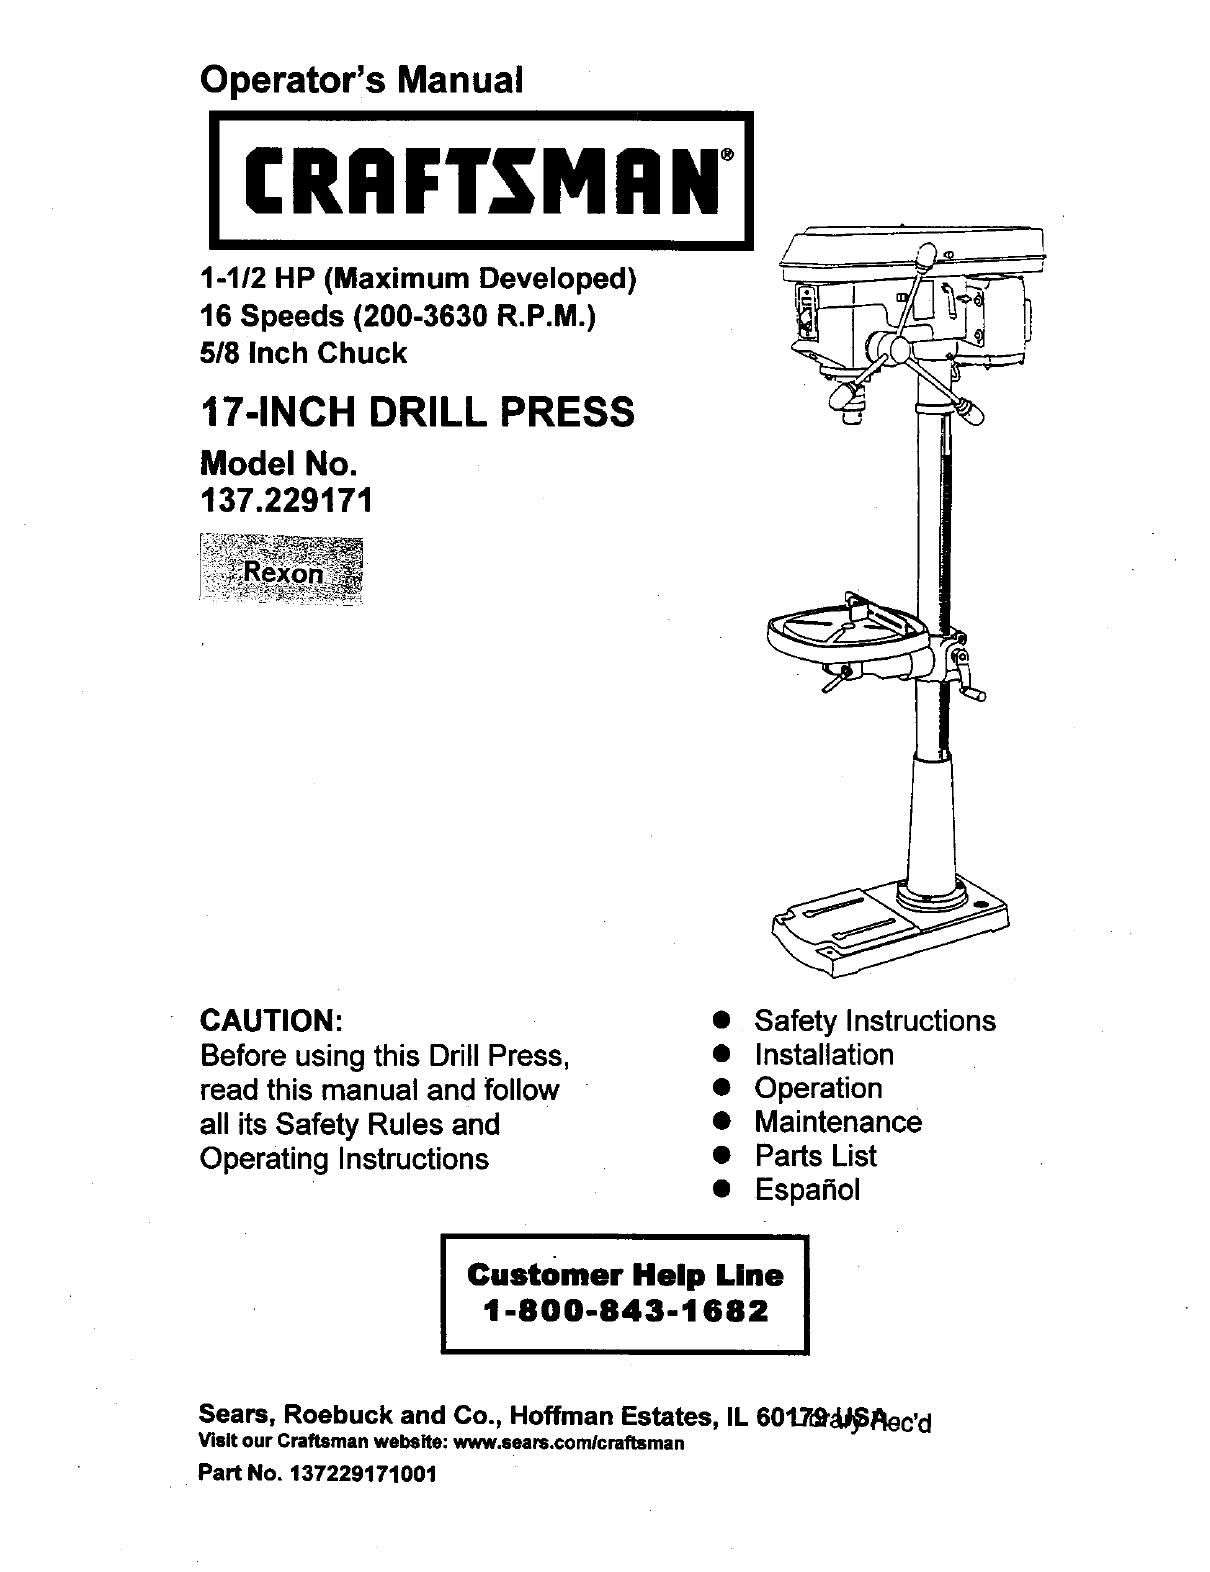 Craftsman Drill Press Parts